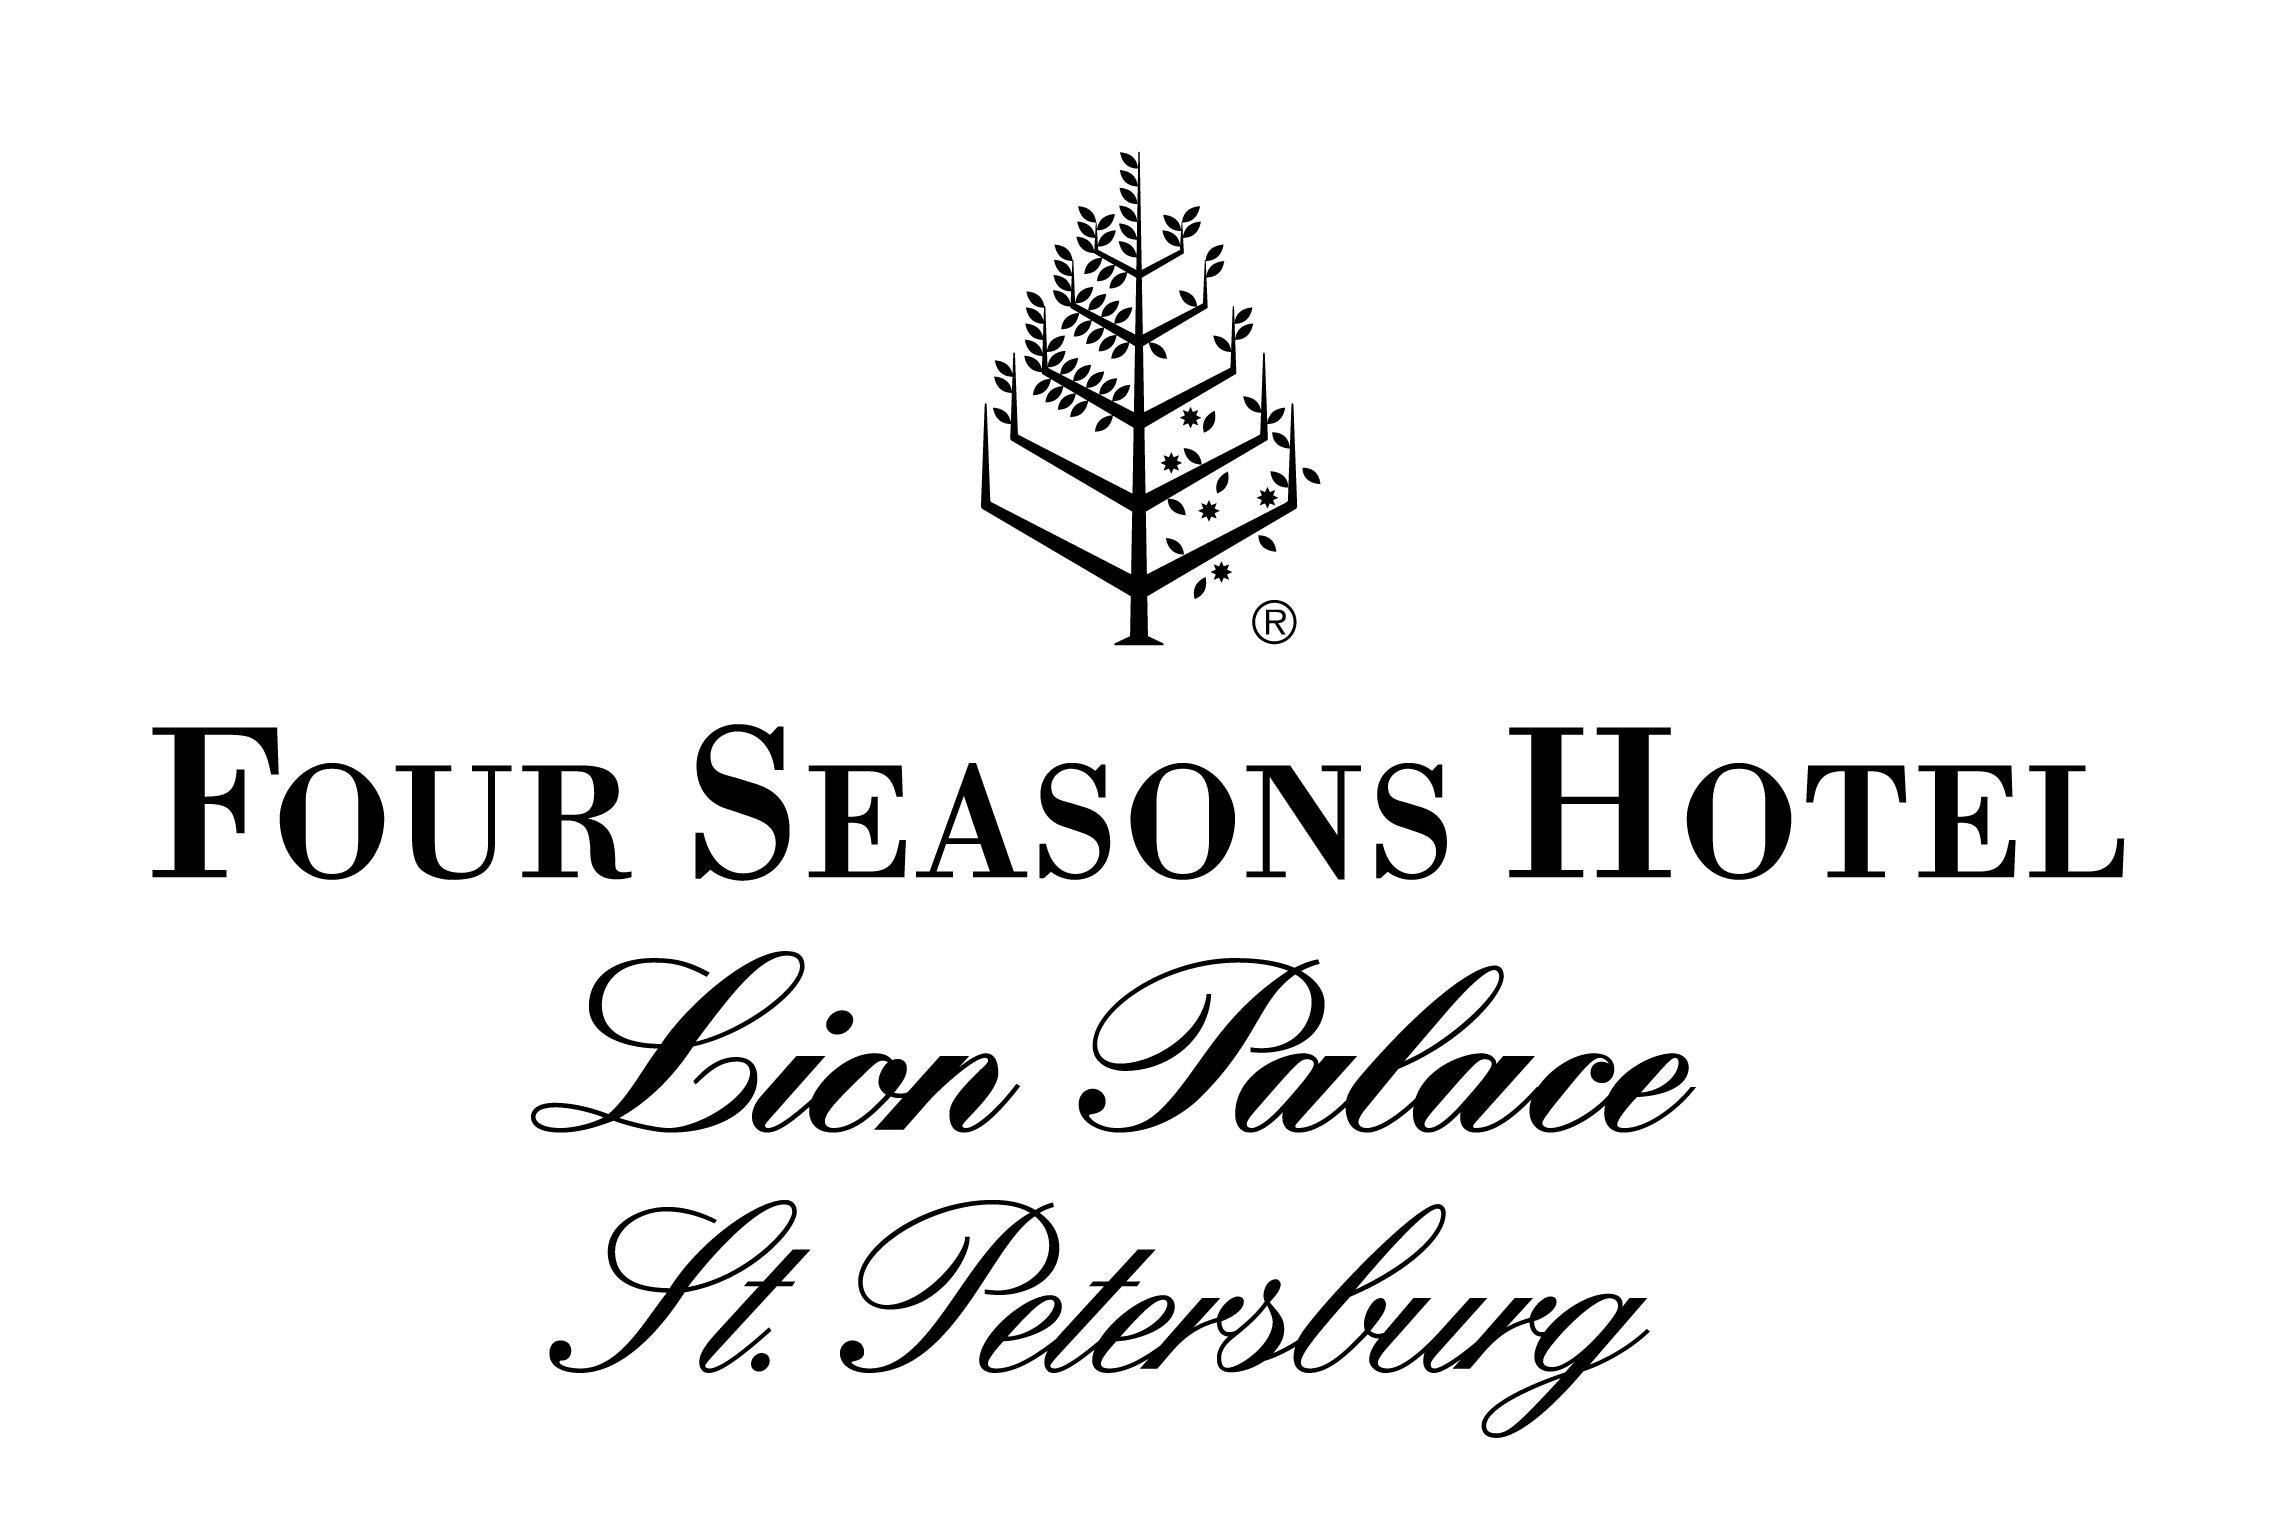 Four Seasons spb.jpg